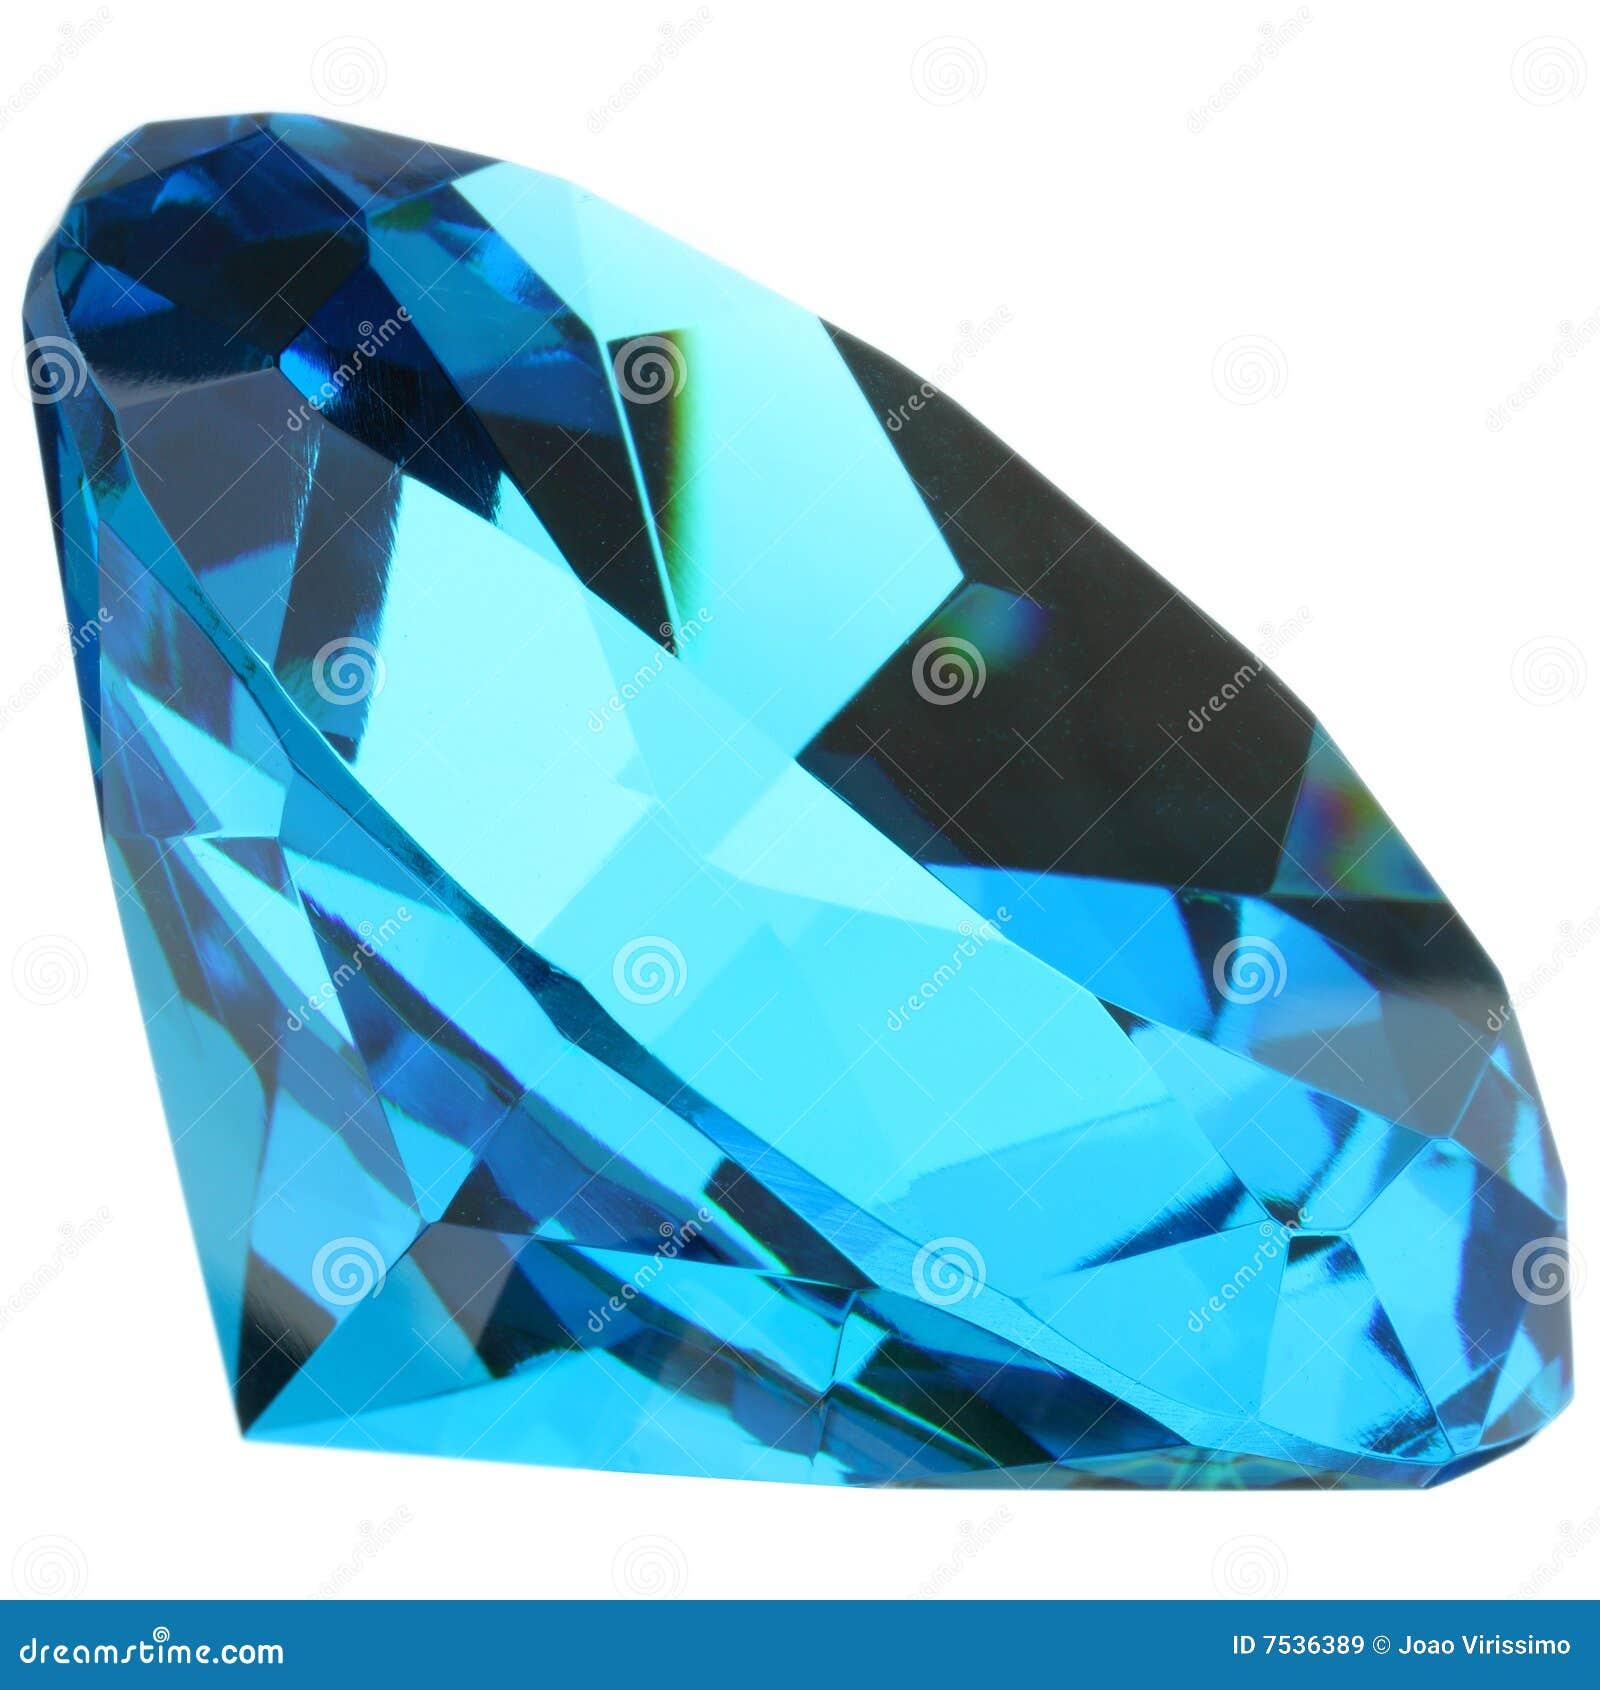 saphir de pierre gemme image stock image du macro vert 7536389. Black Bedroom Furniture Sets. Home Design Ideas